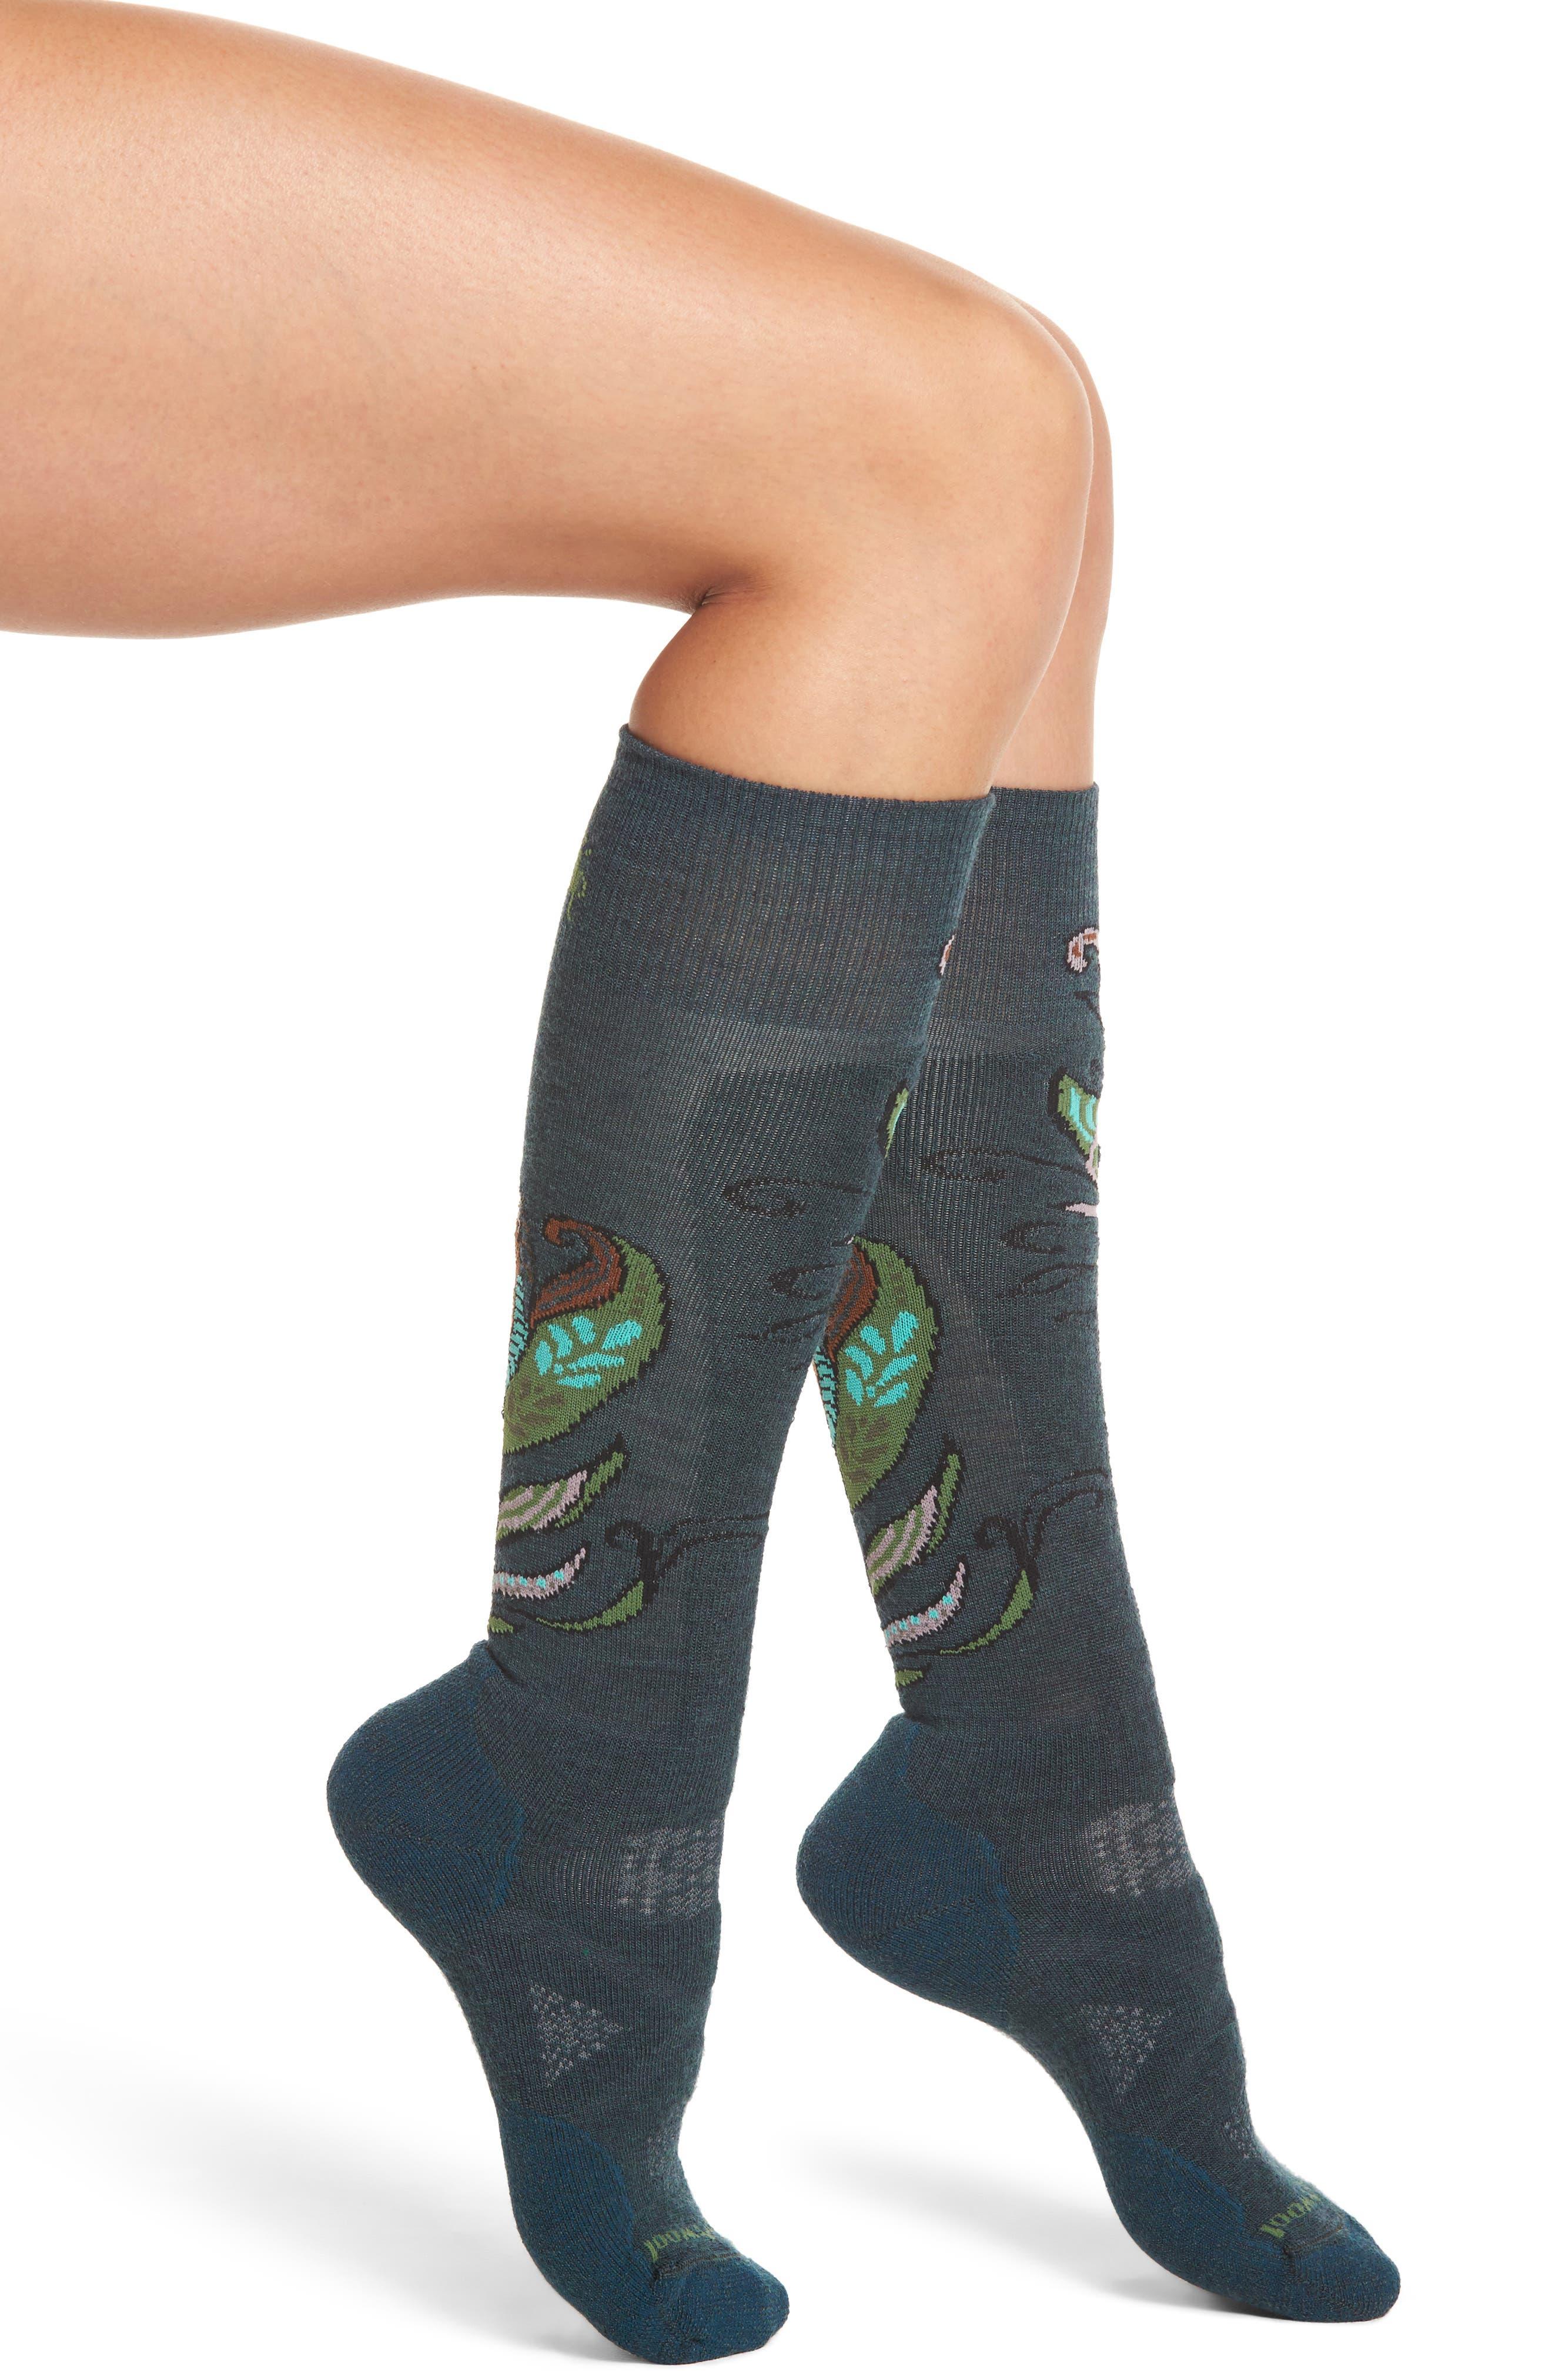 Smartwool PhD® Ski Medium Paisley Socks